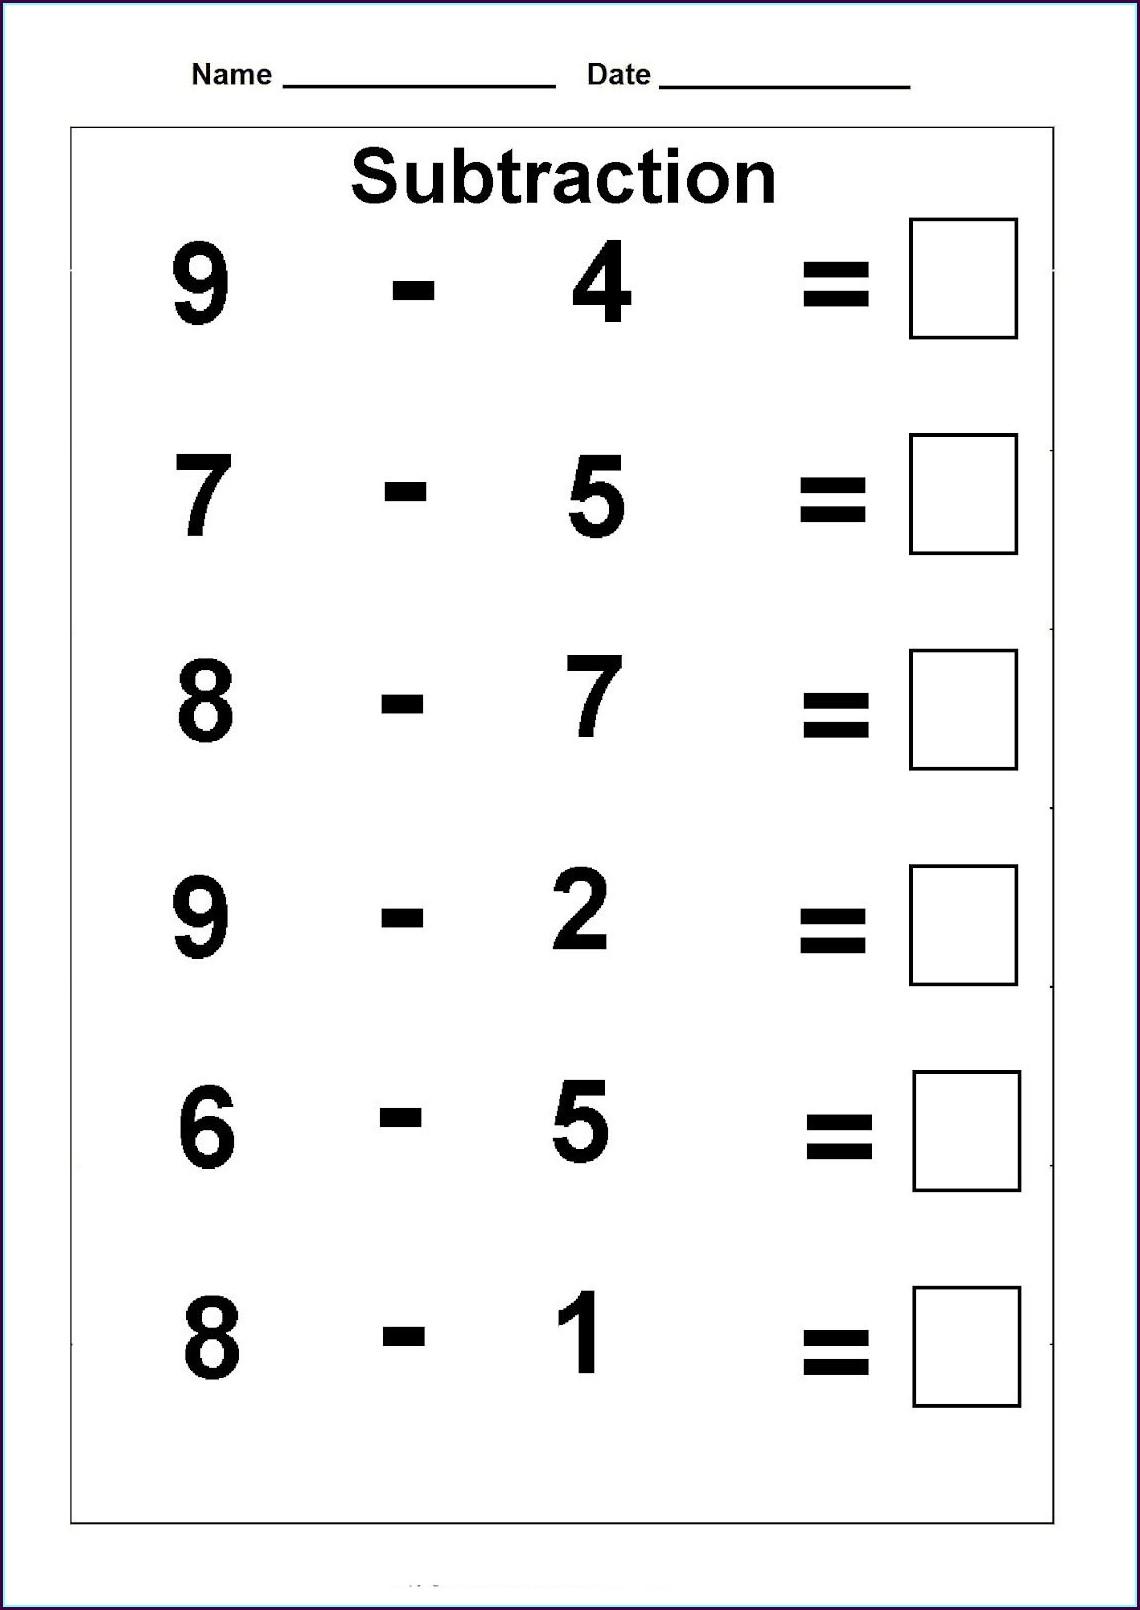 Free Math Worksheet For 1st Grade